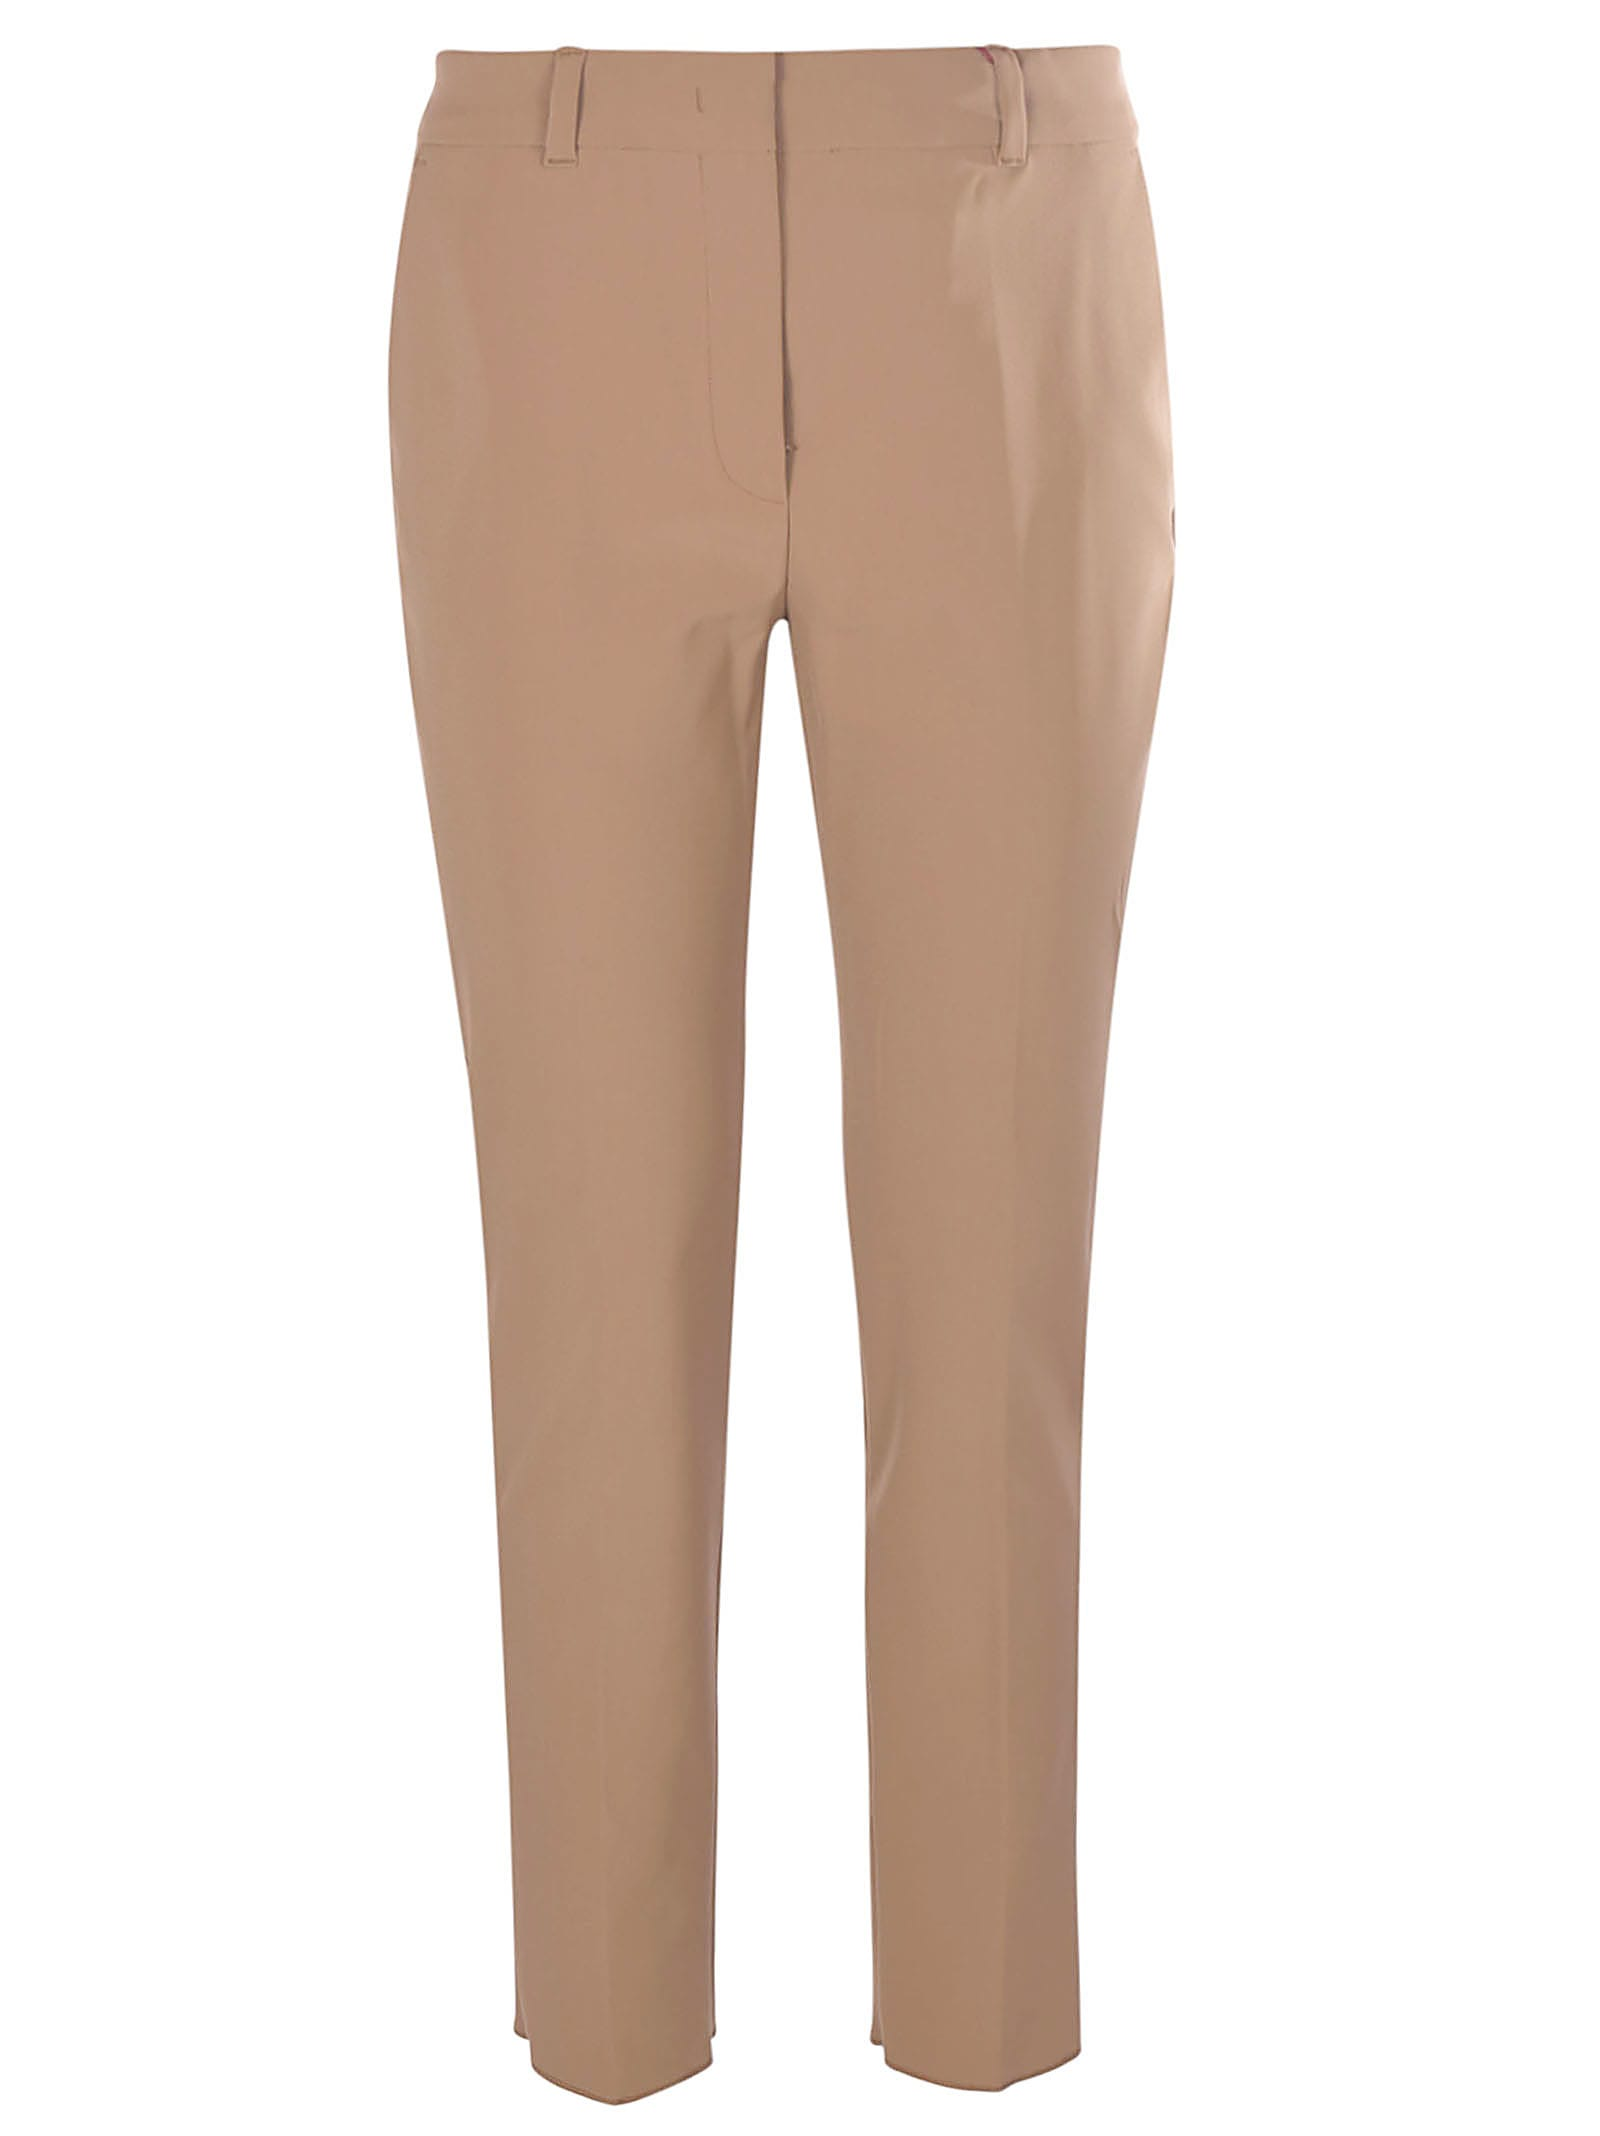 Giga Trousers